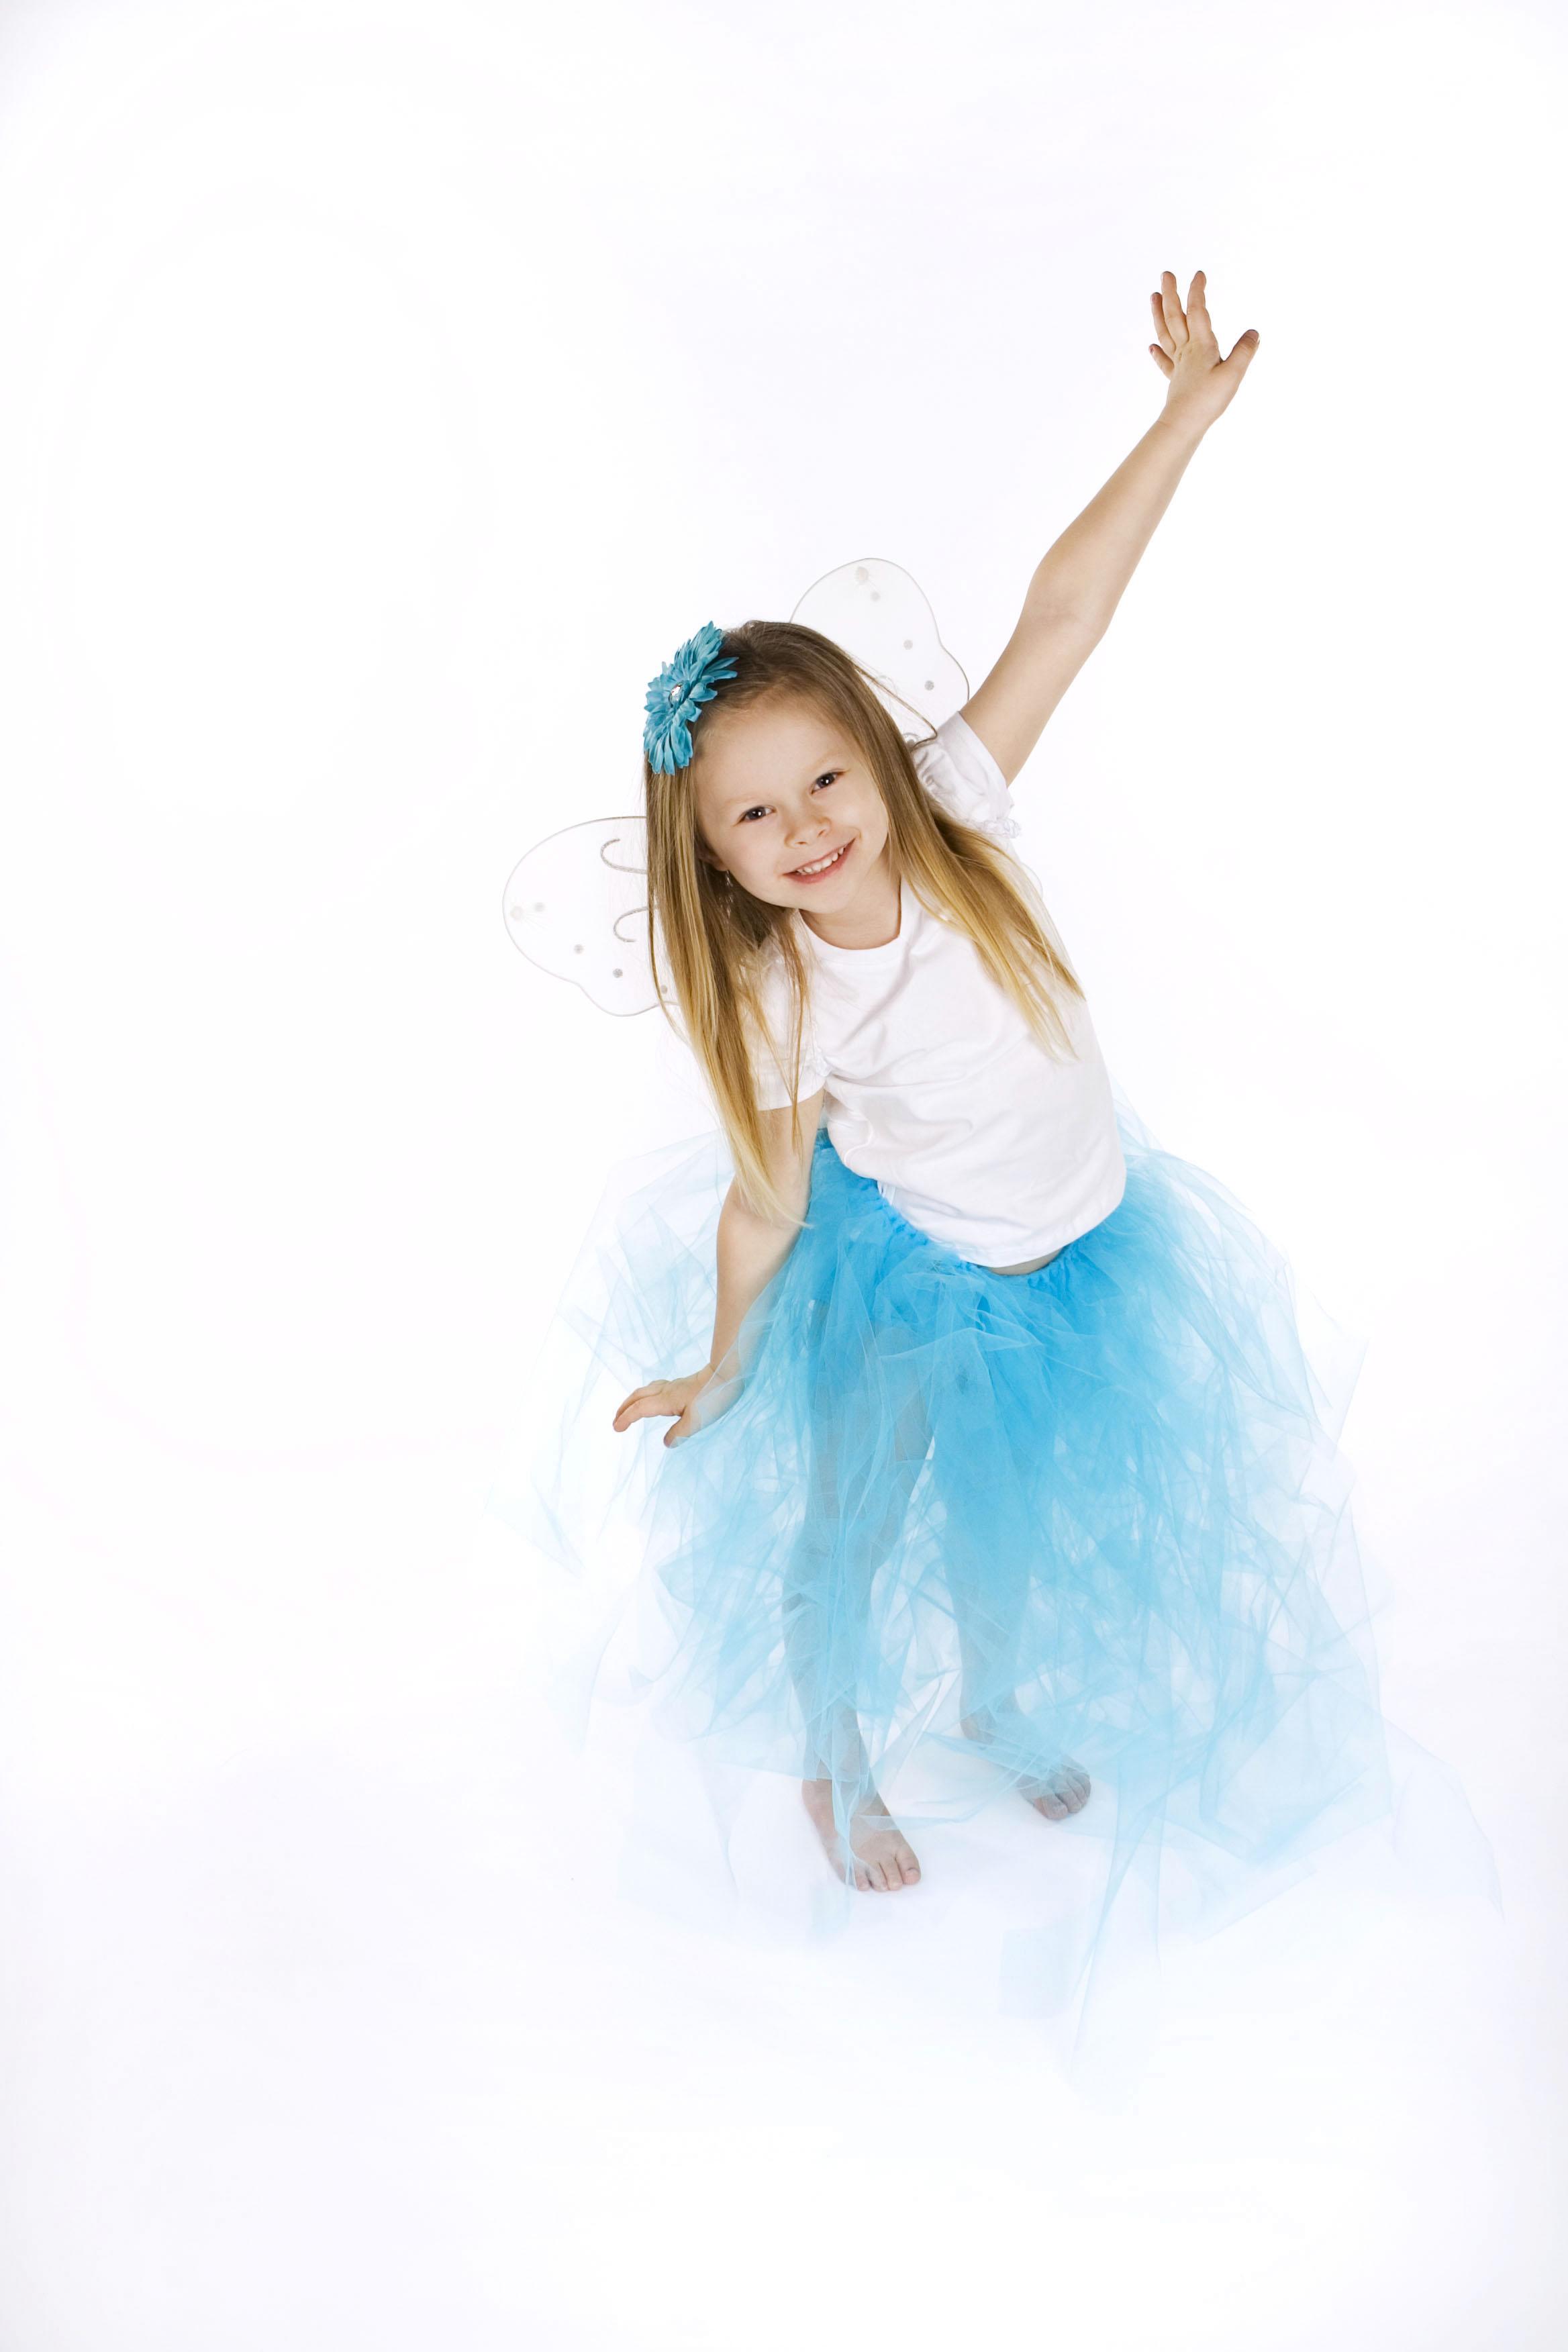 childphotographersinlansingmichiganlittlegirlinstudiofairycostumechildportraits.jpg